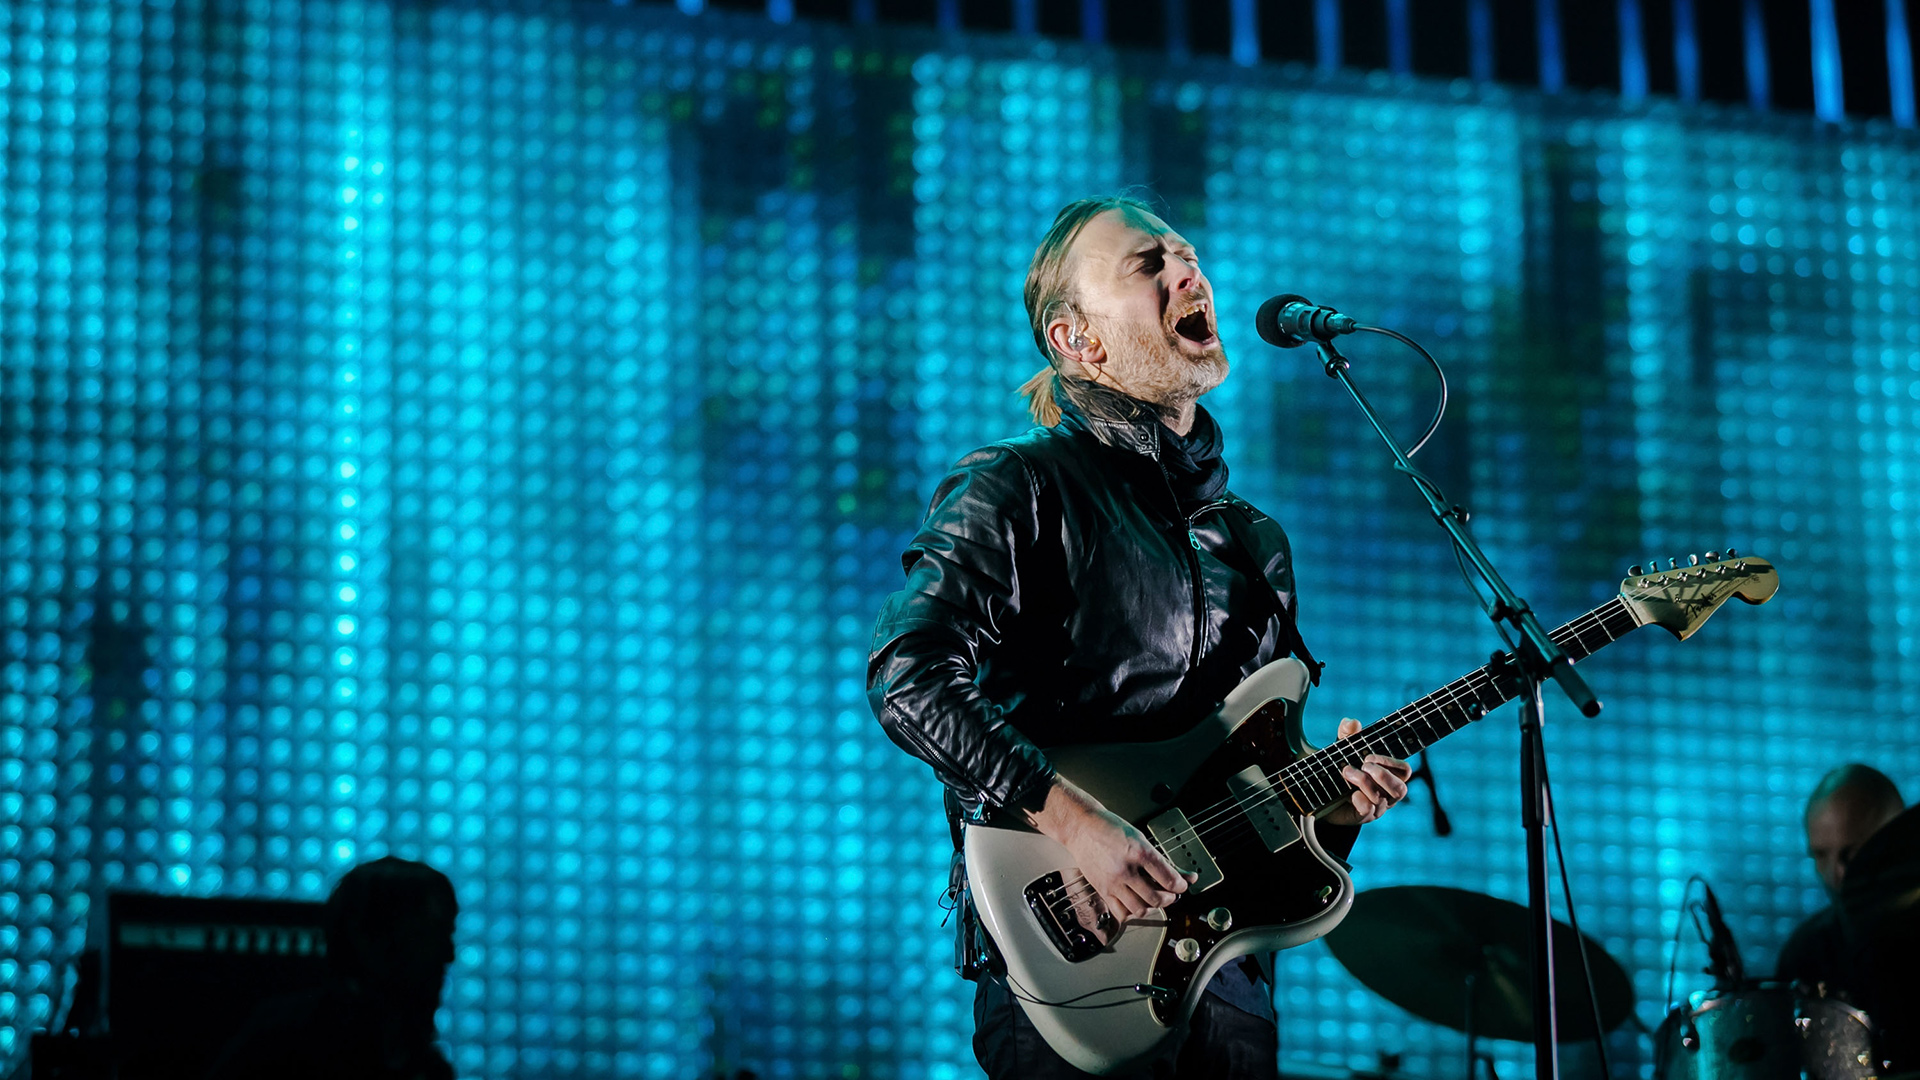 Radiohead_will_release_new_album_in_june